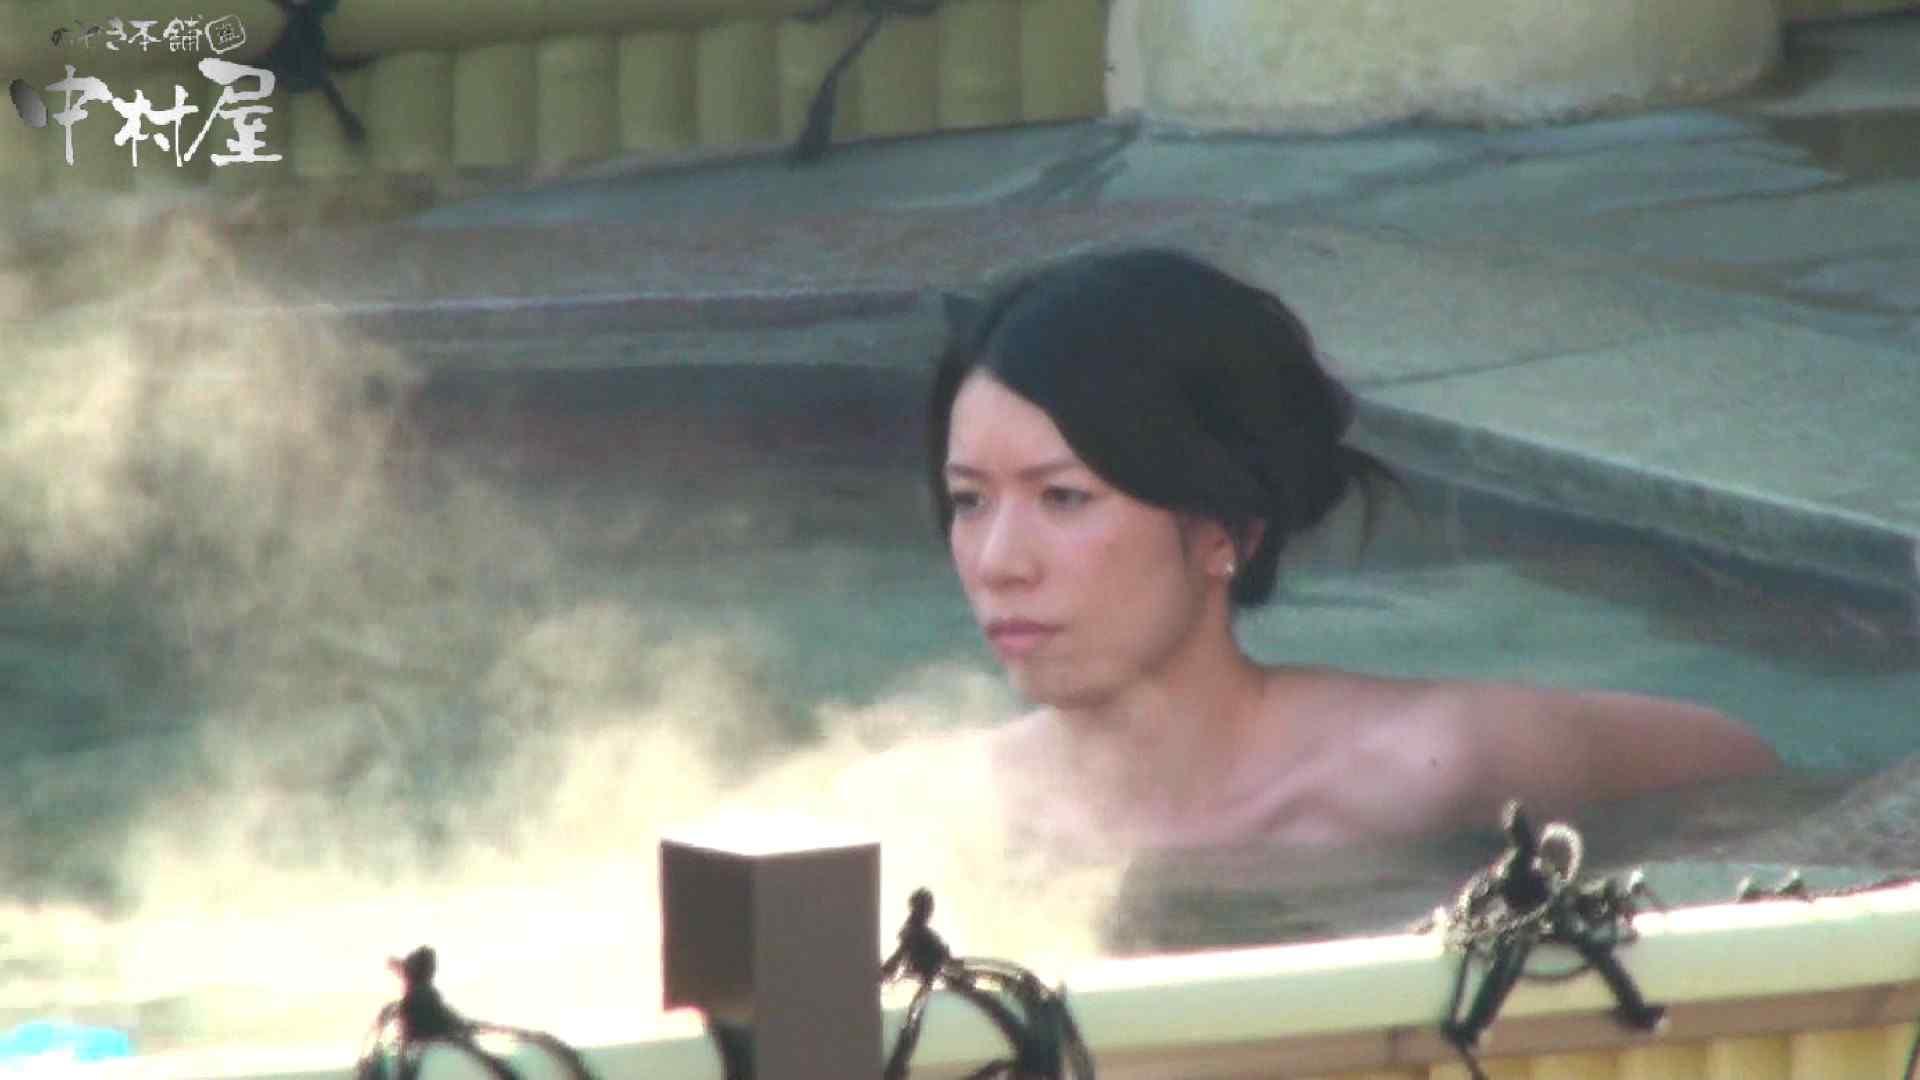 Aquaな露天風呂Vol.919 OLのエロ生活   露天風呂  91連発 58